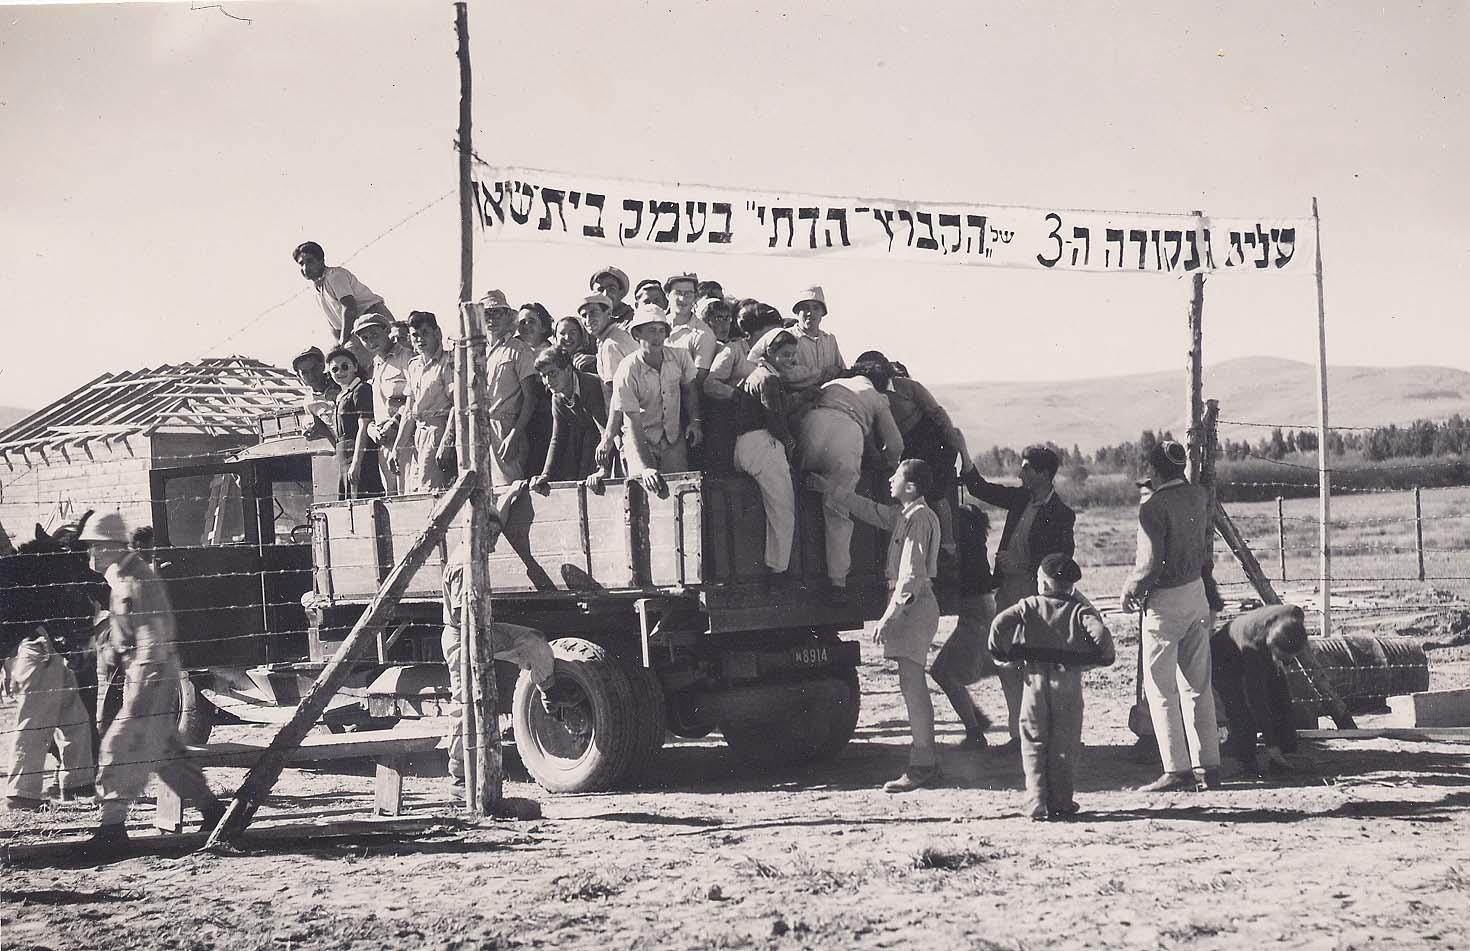 Residents of Kibbutz Ein Hanatziv settle near Bet She'an, 1946.